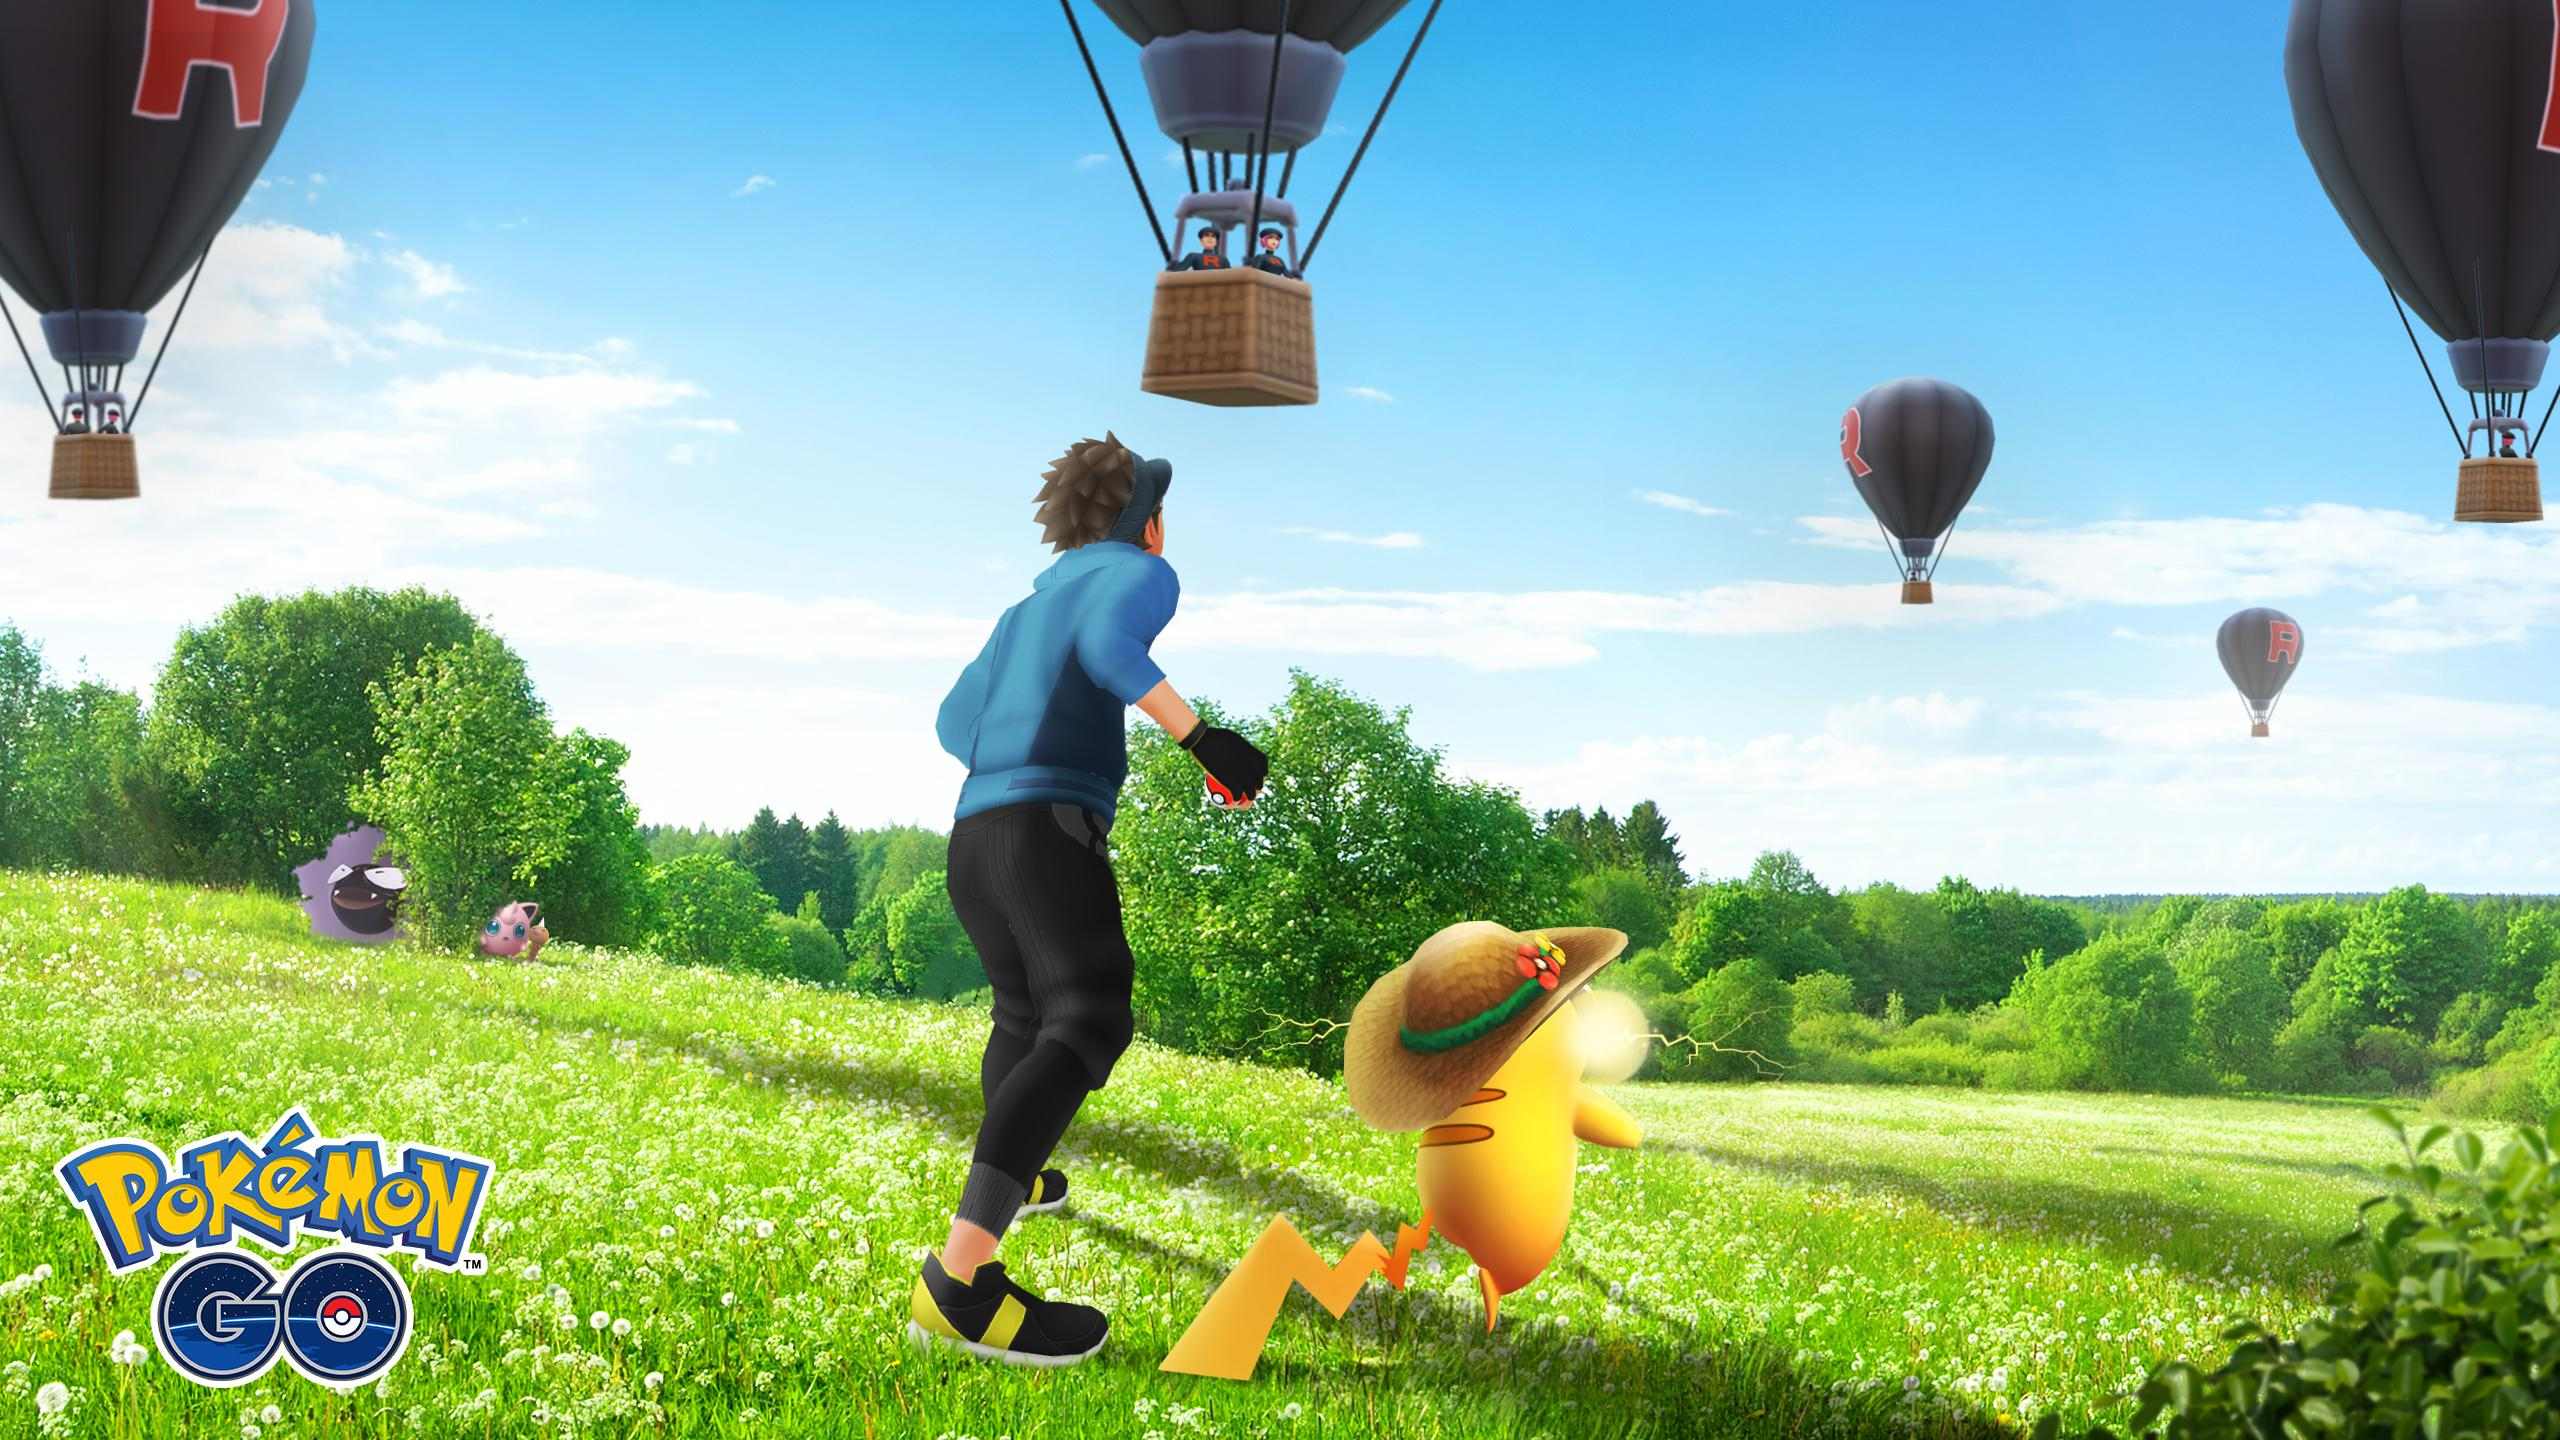 Go Rocket Balloon